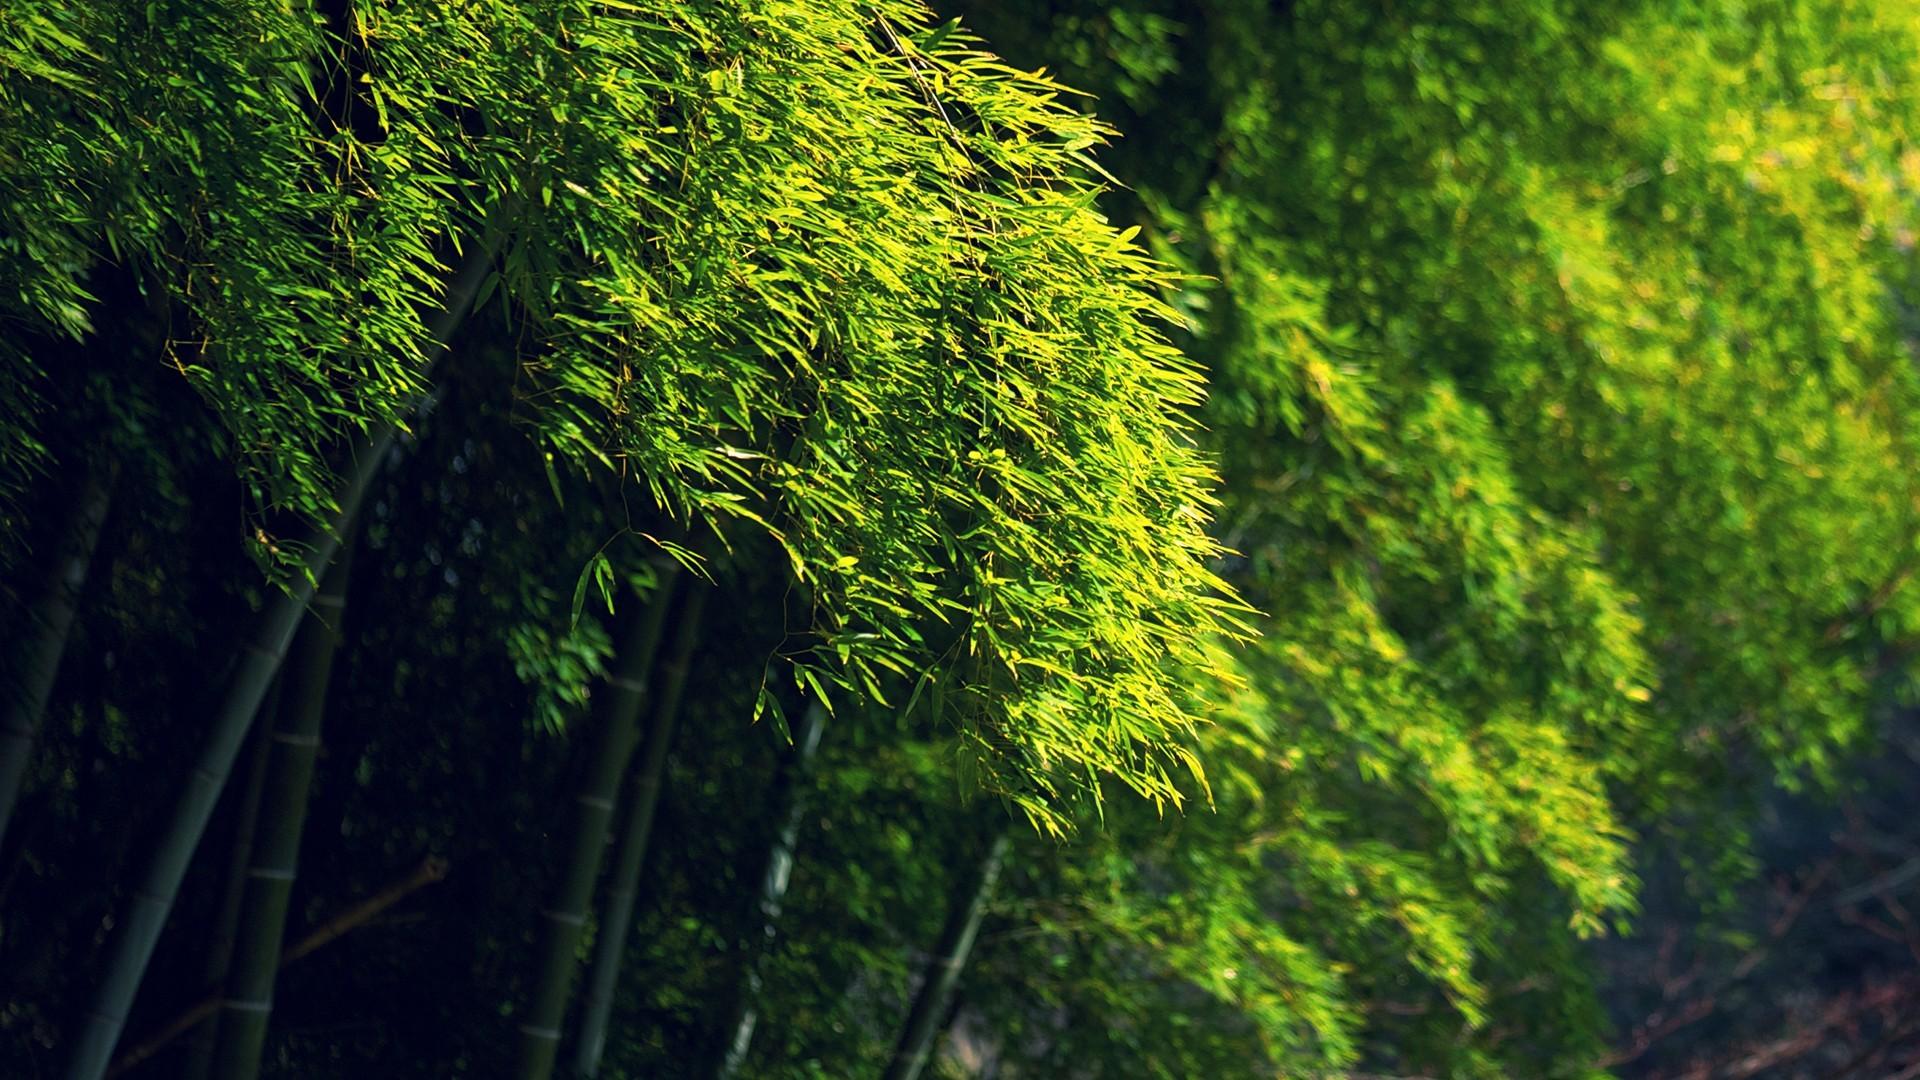 картинки релаксация лес может вообще